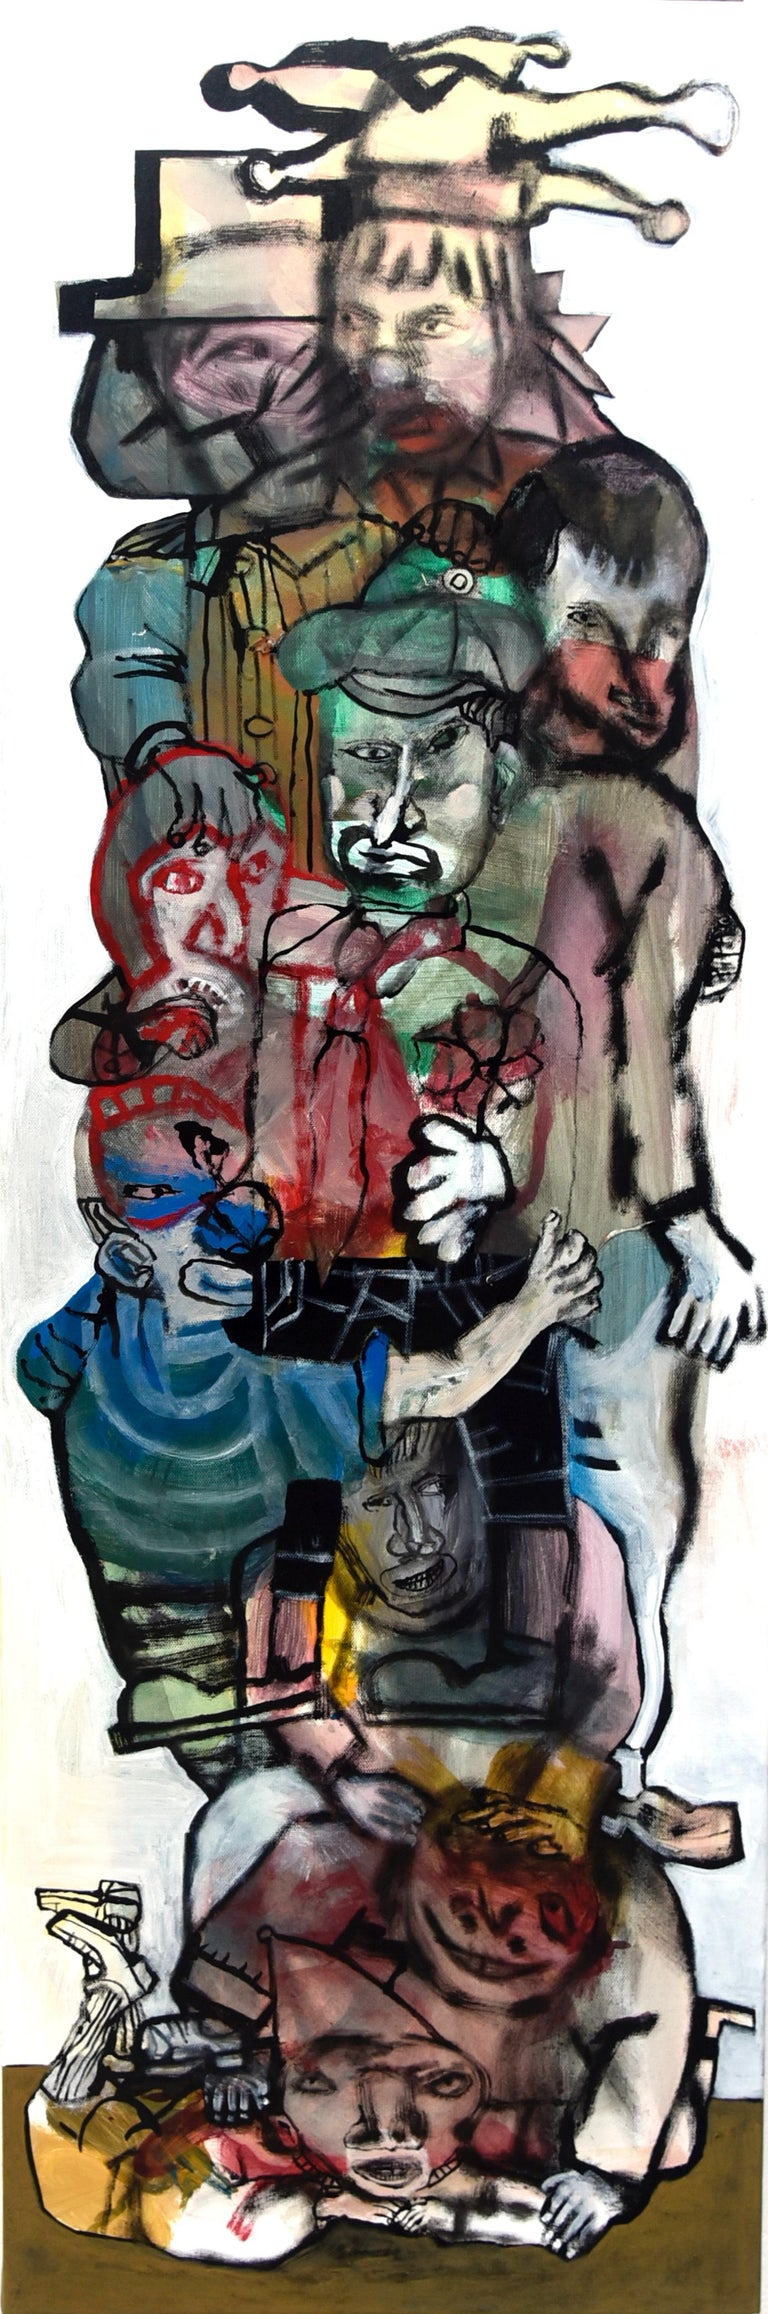 The acrobats III - Sergio Moscona, 21st Century, Figurative painting - Painting by Sergio Moscona